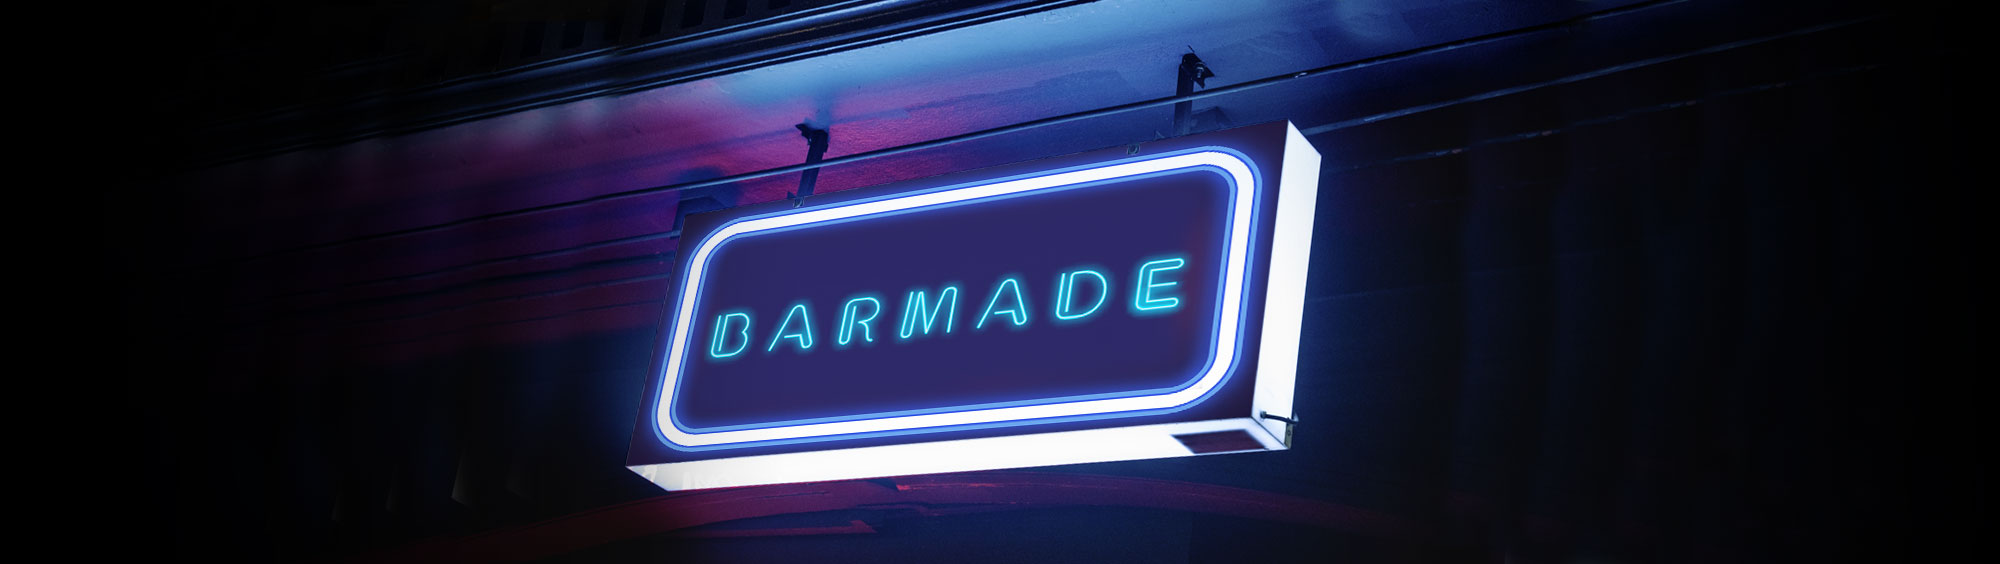 Barmade